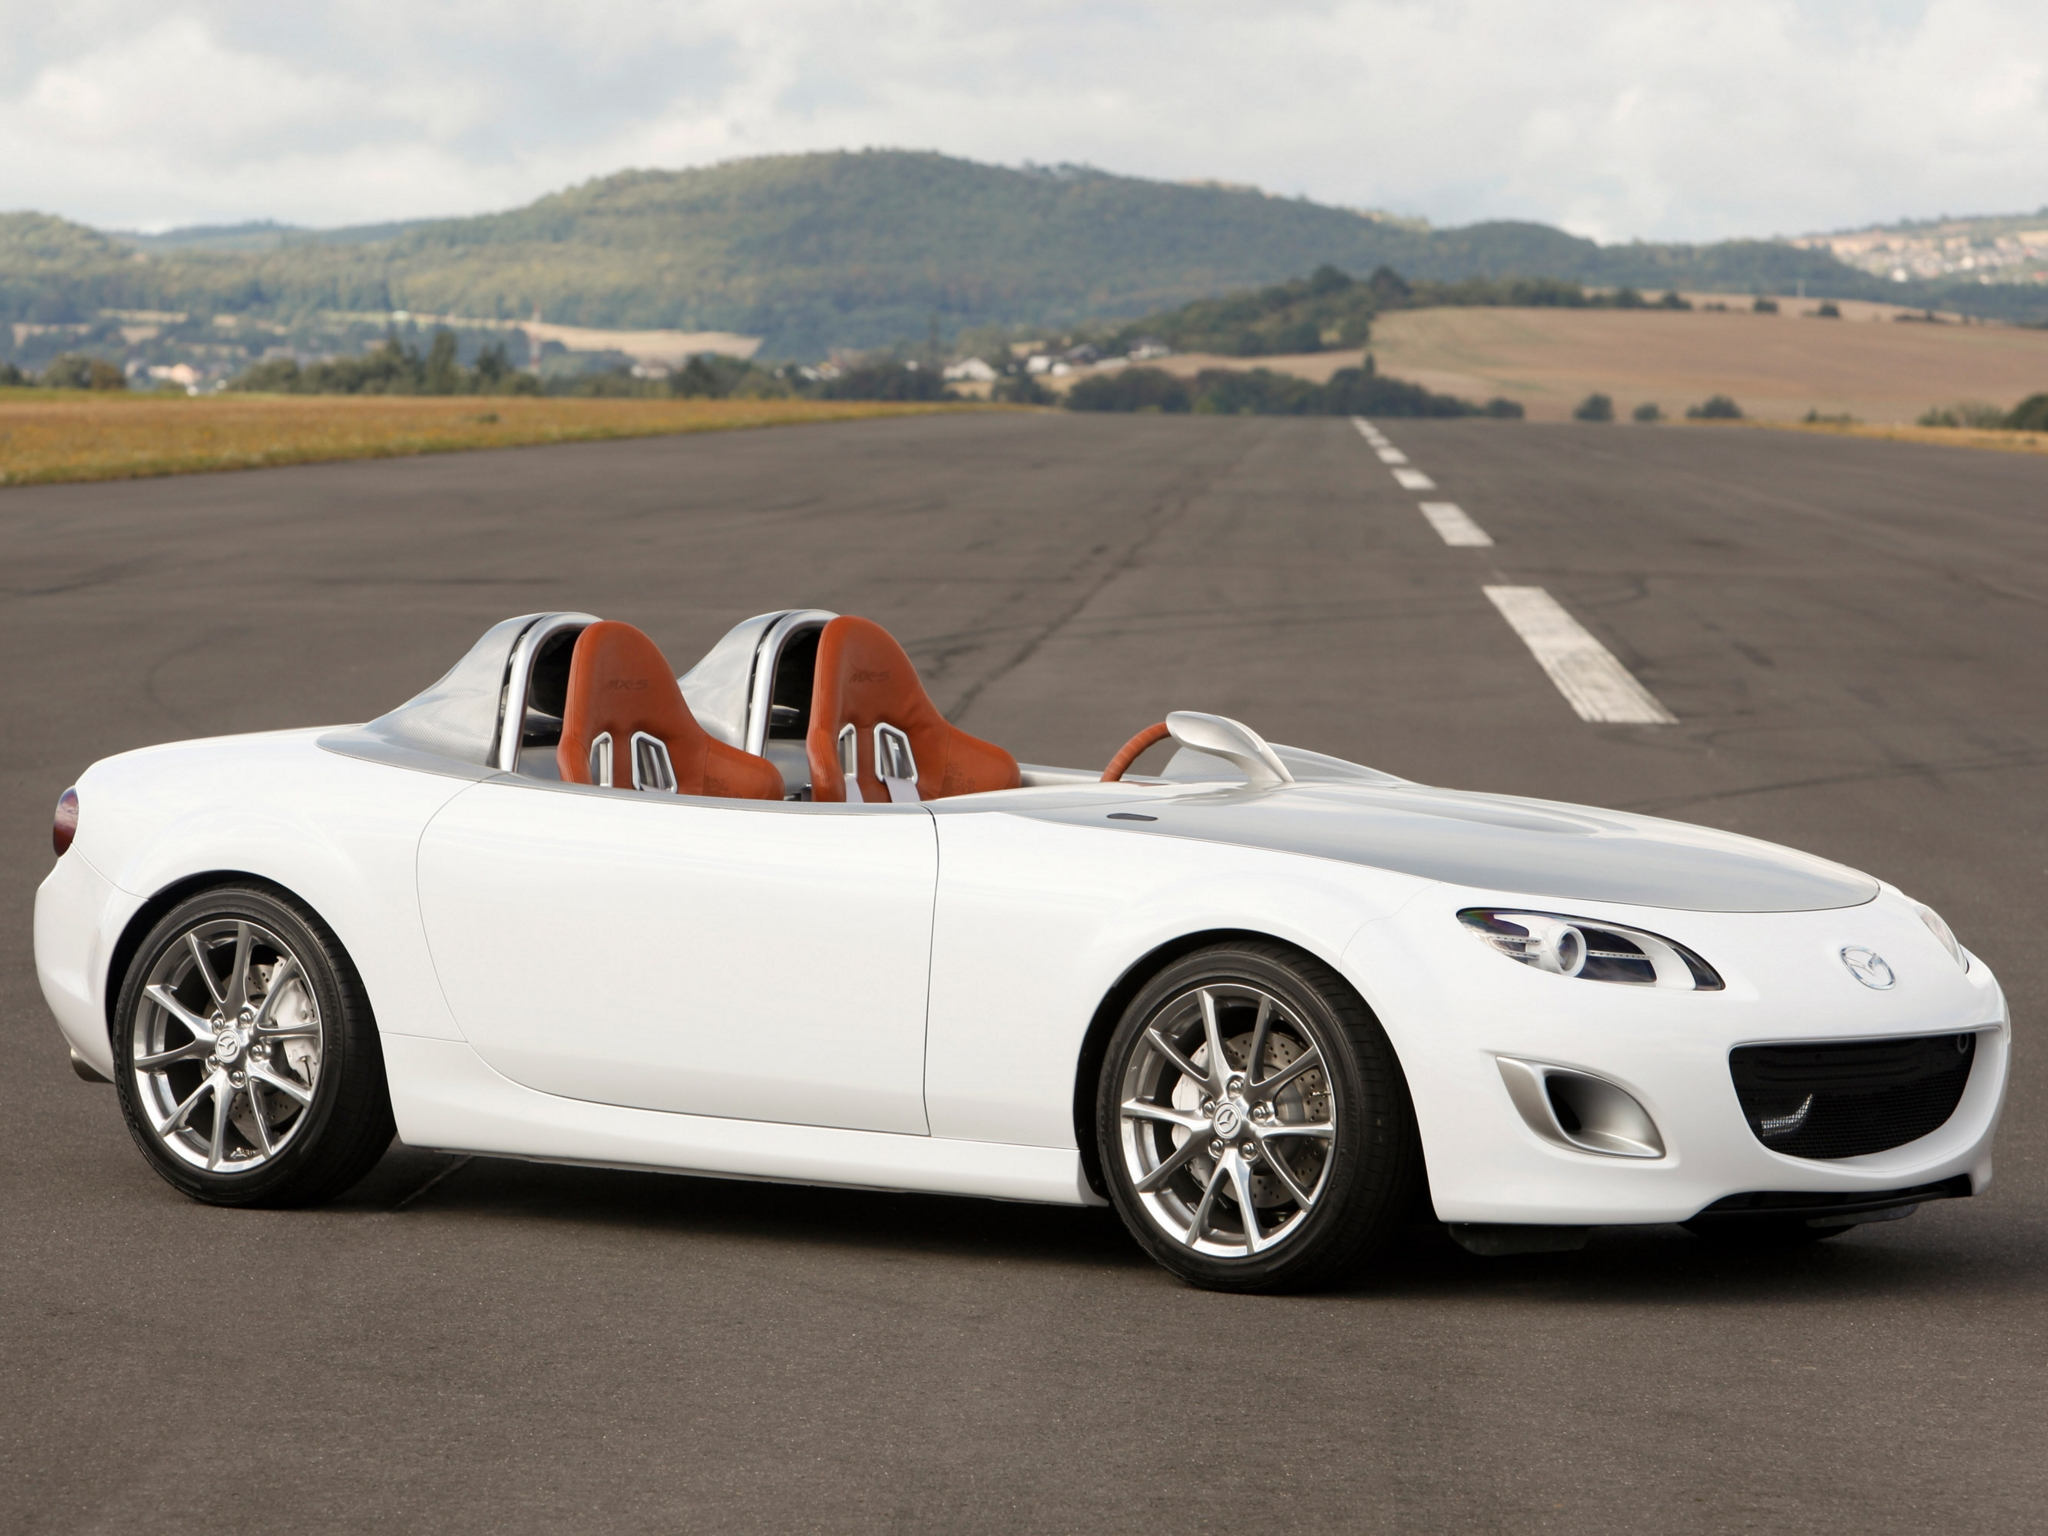 Mazda MX-5 Superlight Concept 2009